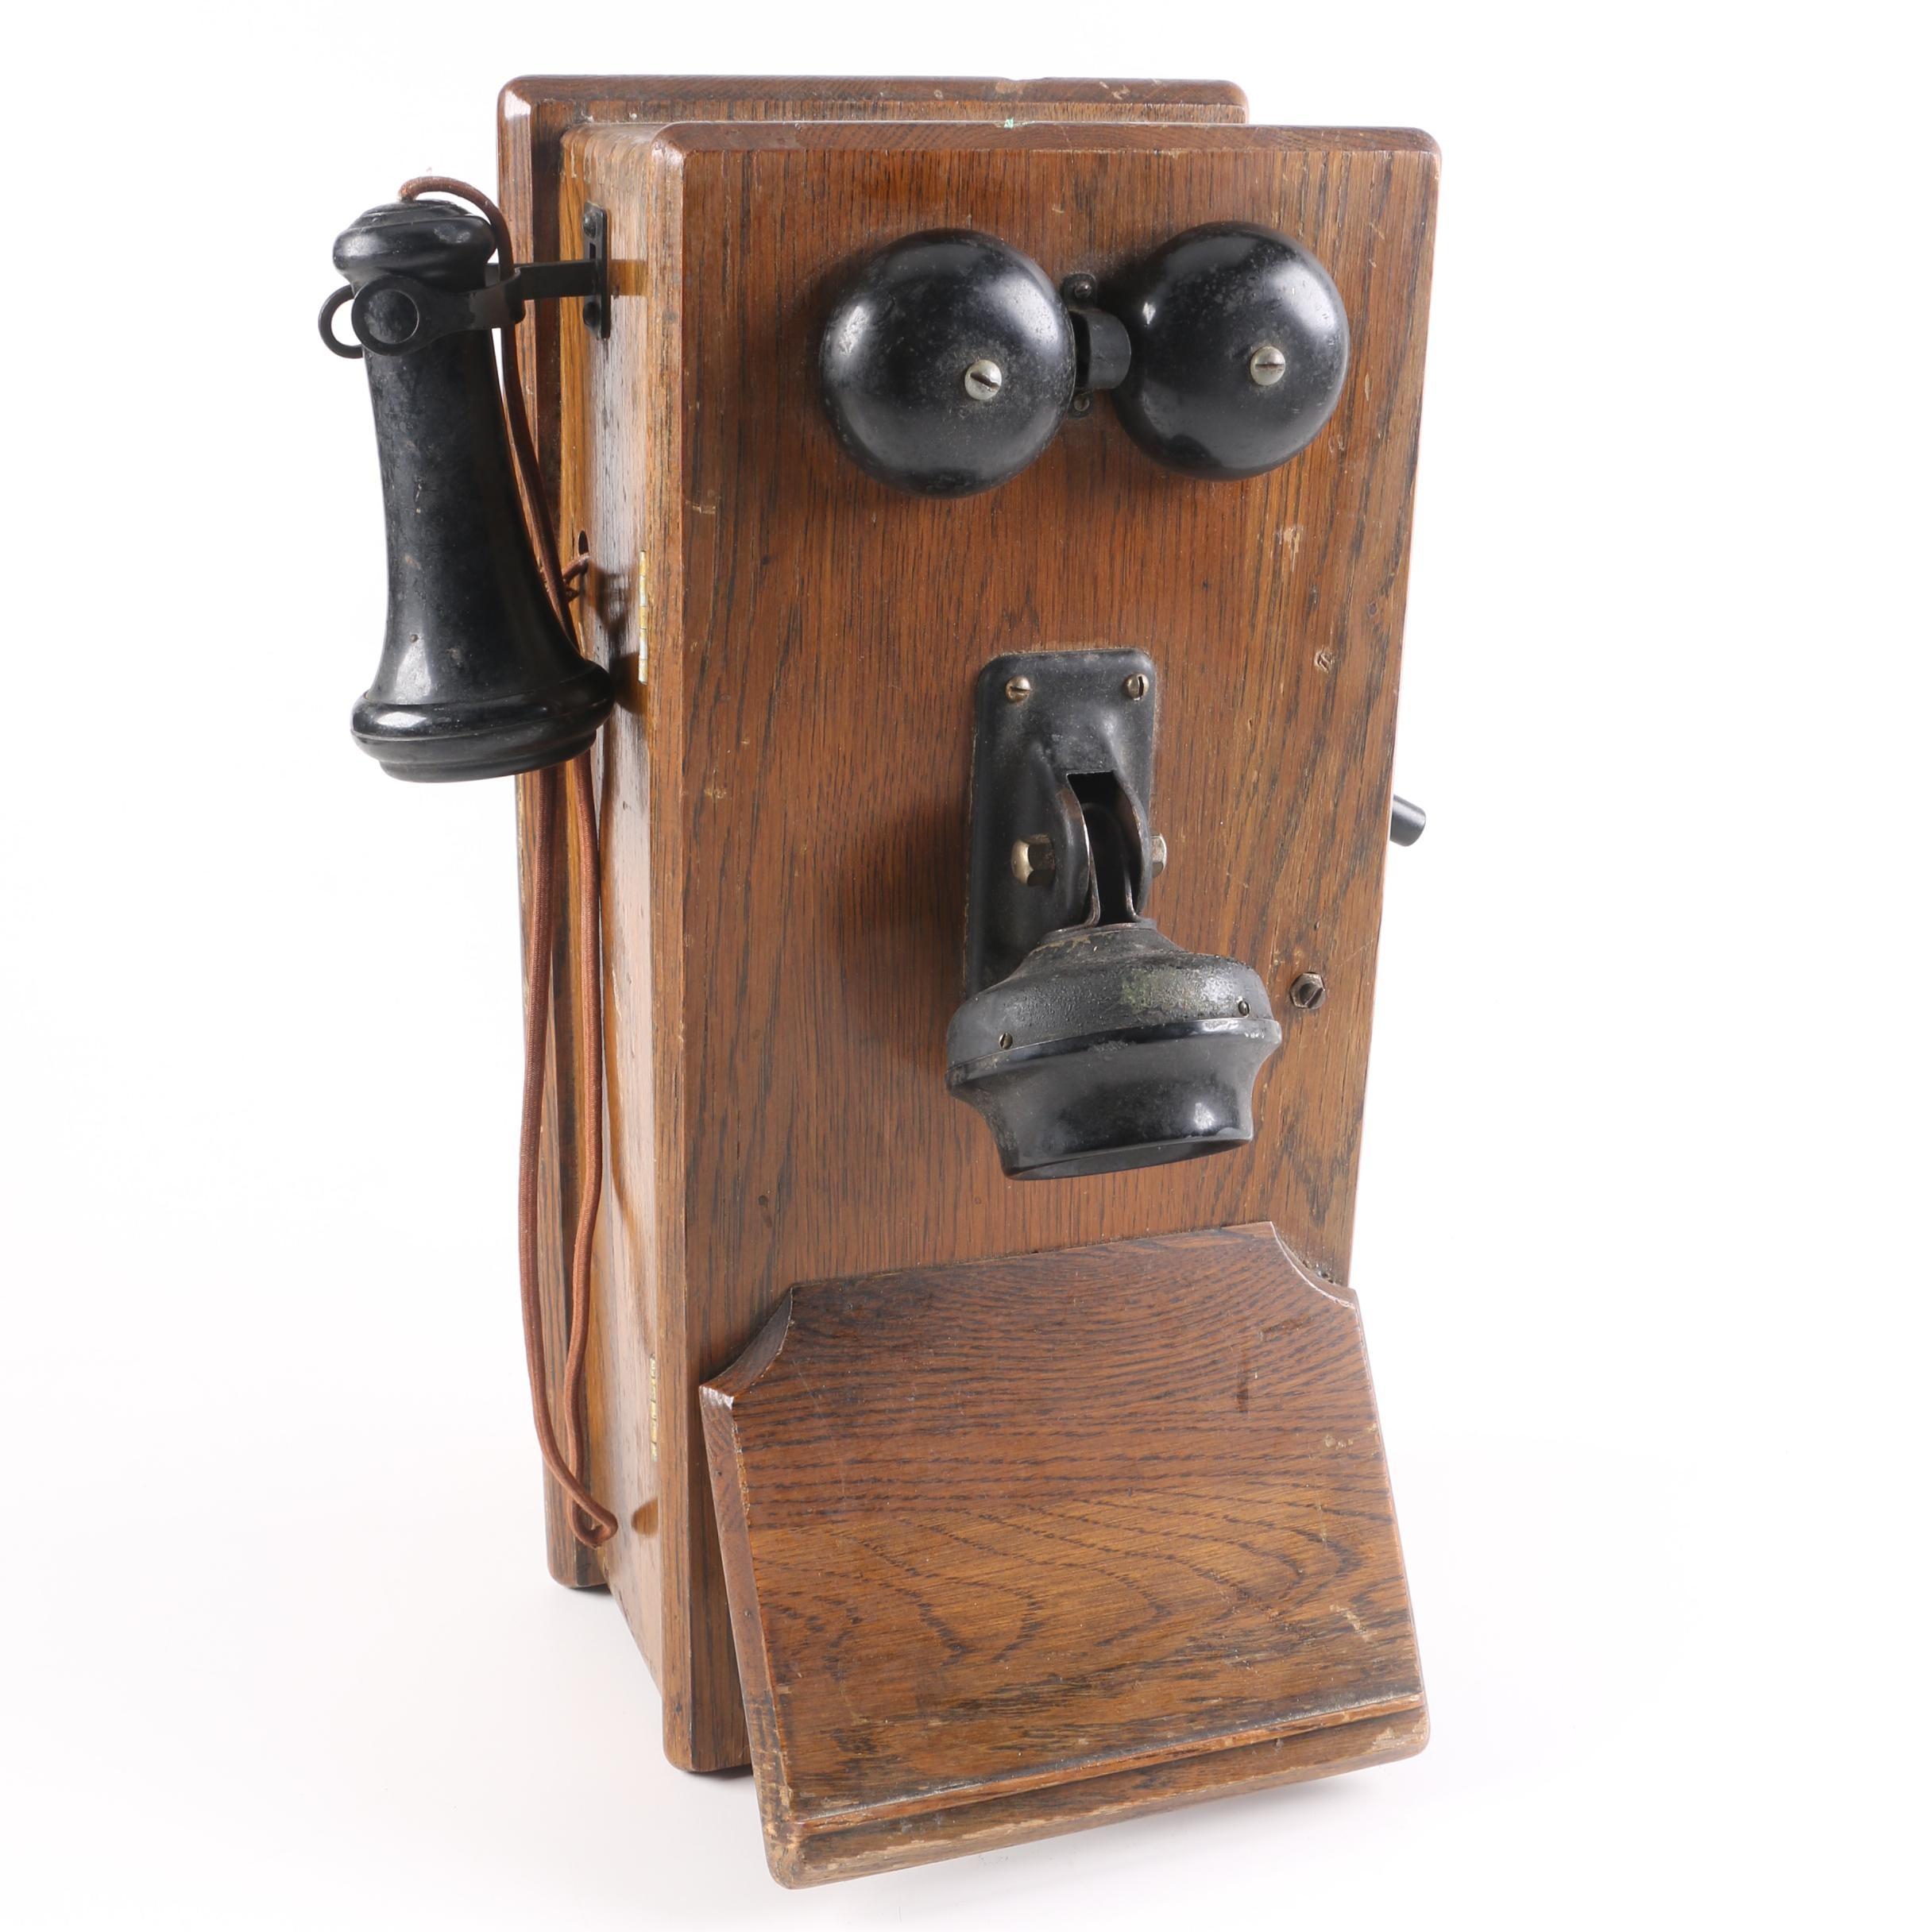 Antique Magneto Wall Compact Crank Telephone